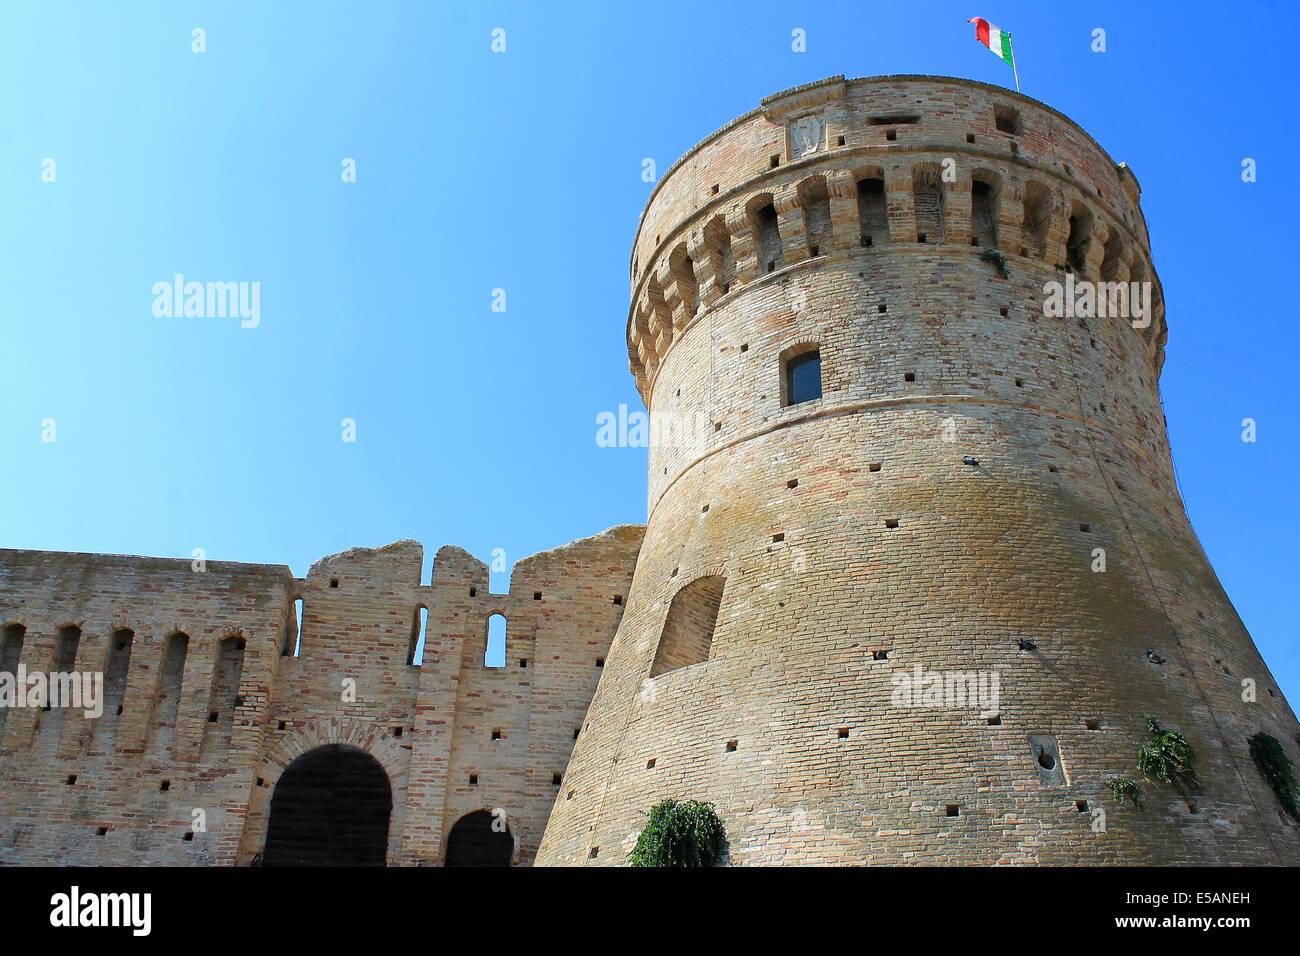 Fortress of Acquaviva Picena, Marches, Italy - Stock Image